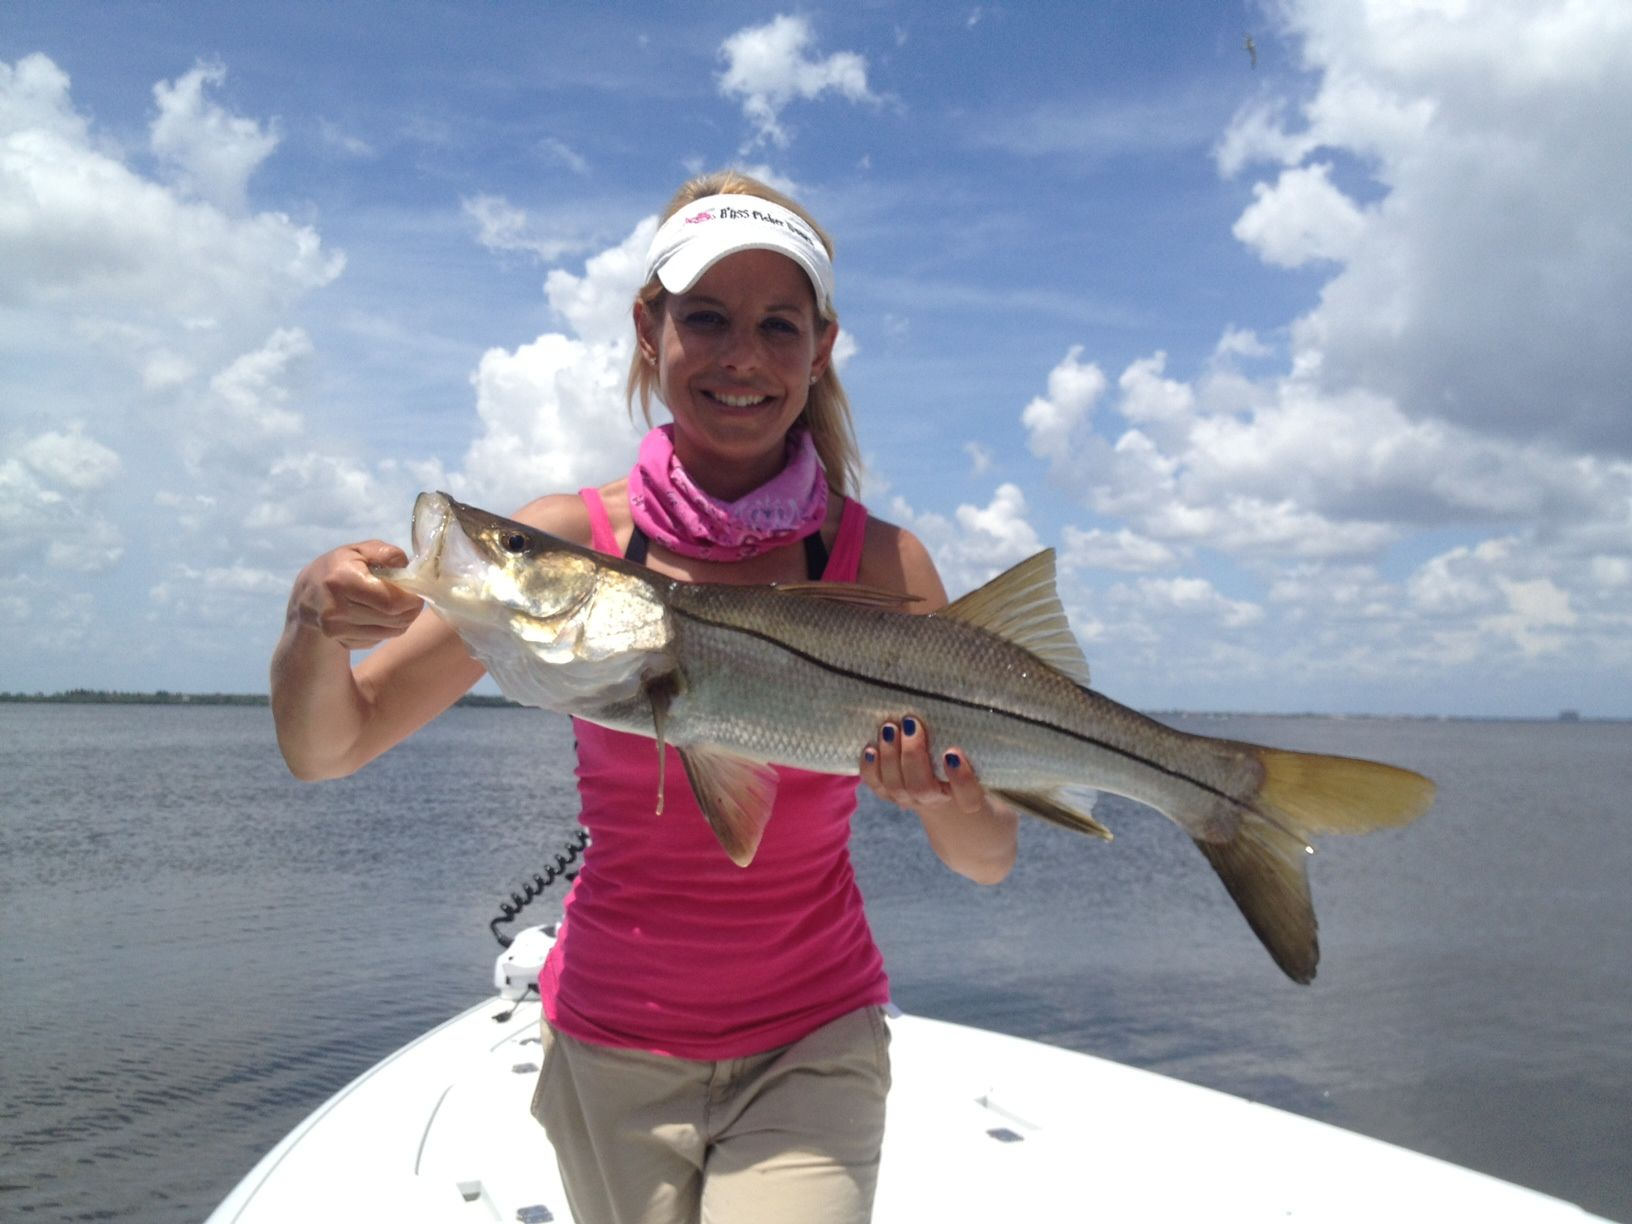 Home She Fishes Saltwater fishing, Fishing girls